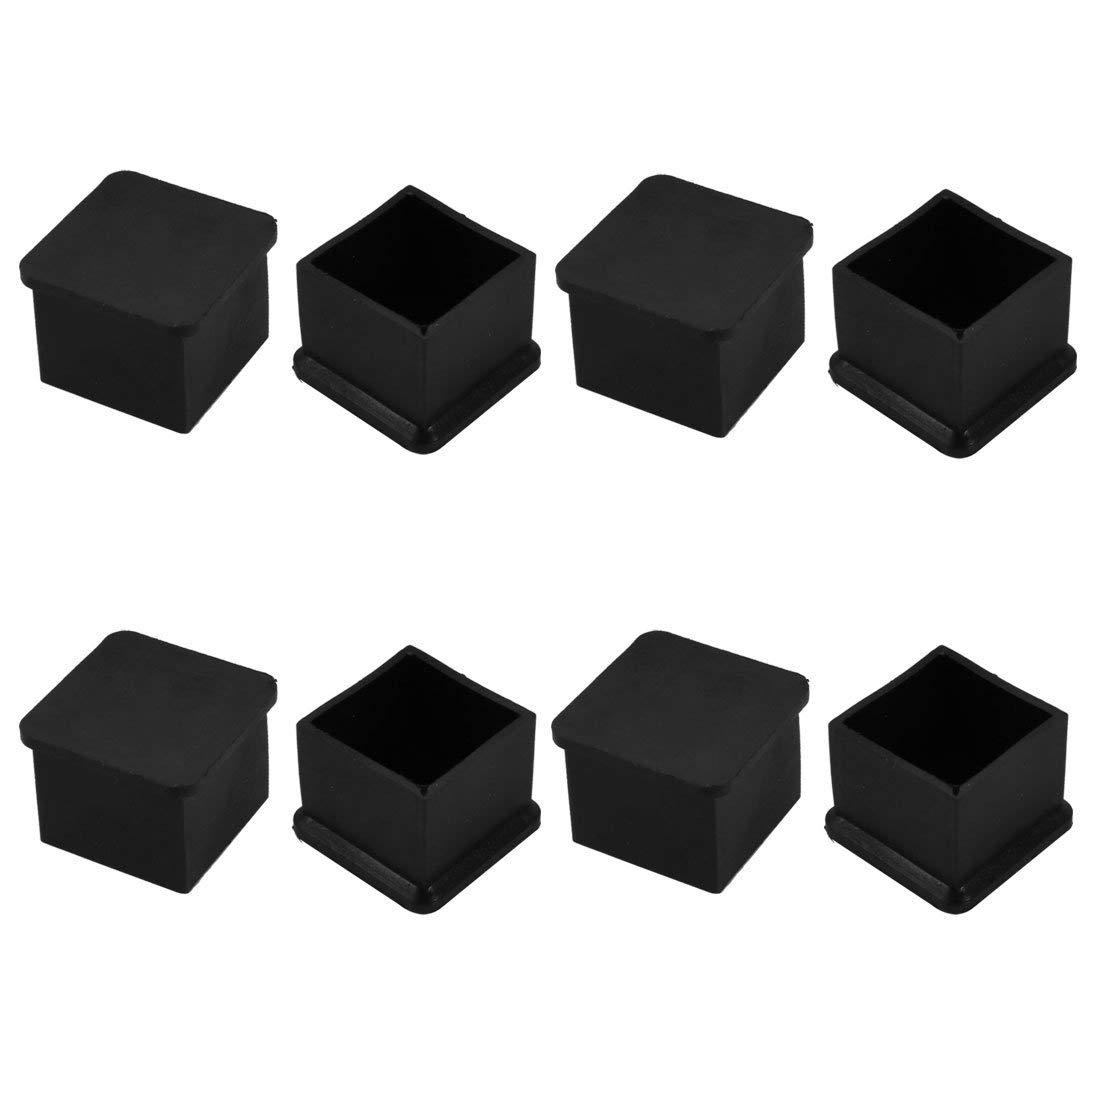 8pc 30mm x 30mm Tuyau Insert Chaise Jambe Cap Carr/é Noir PVC Bouchon Tube